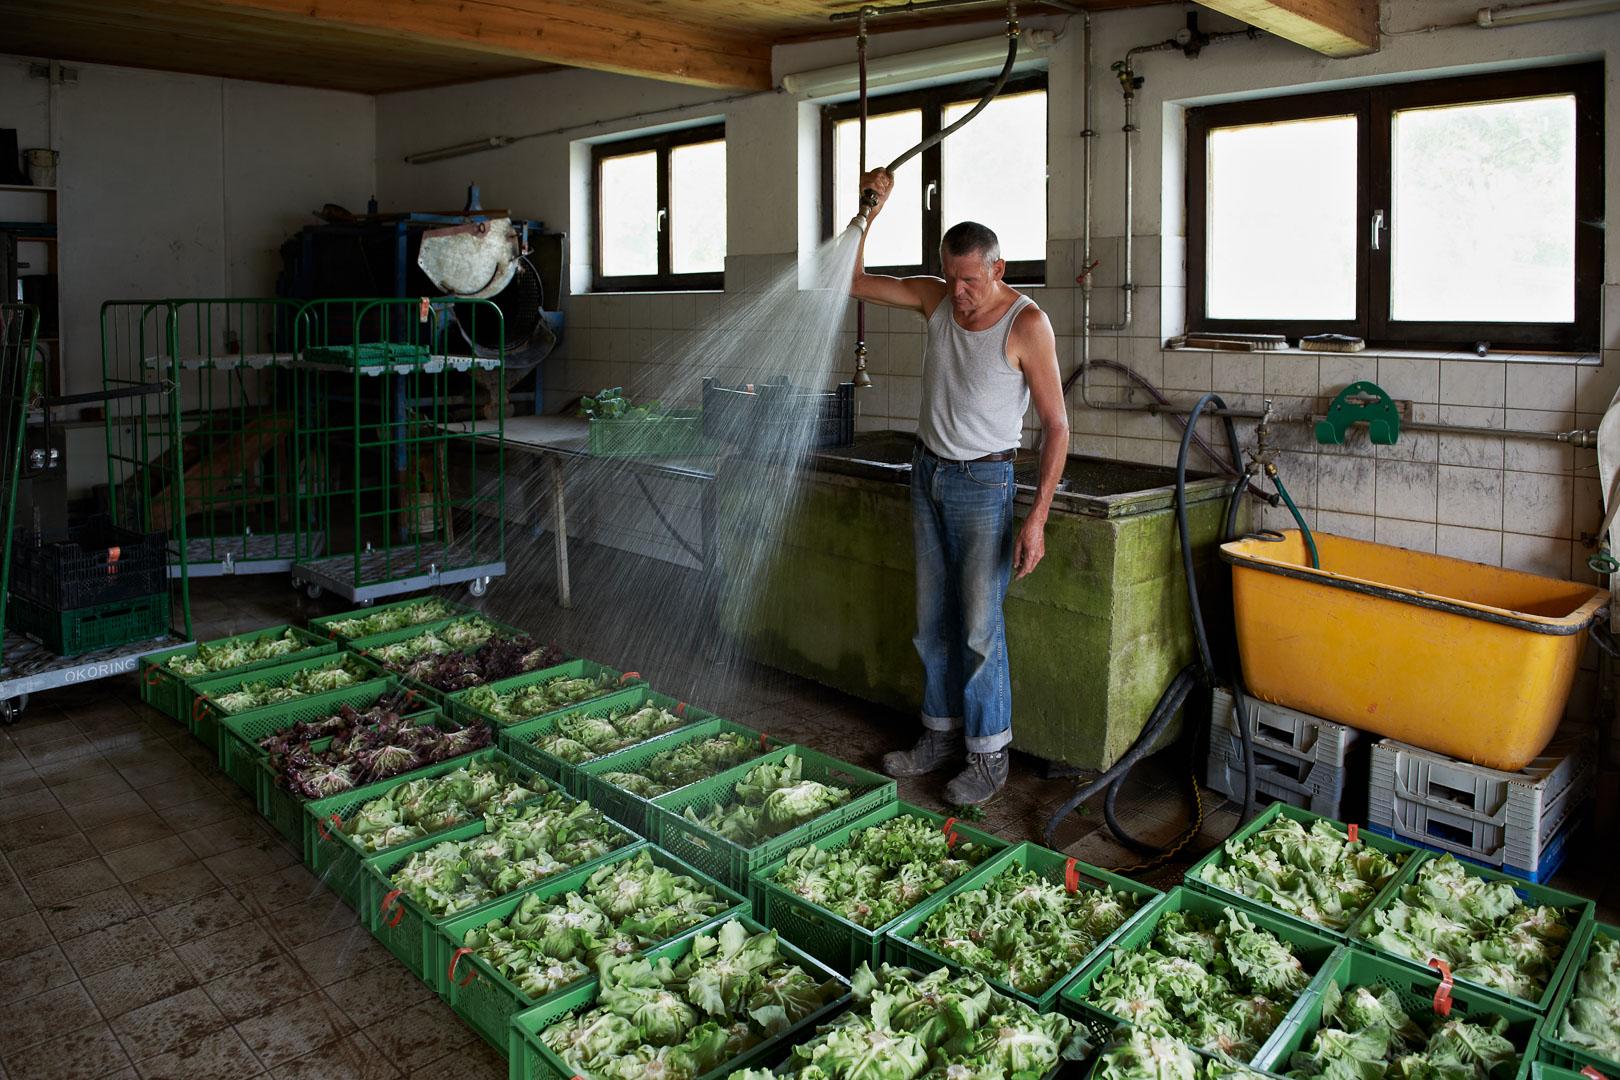 Betz Alfred säubert den frisch geernteten Salat